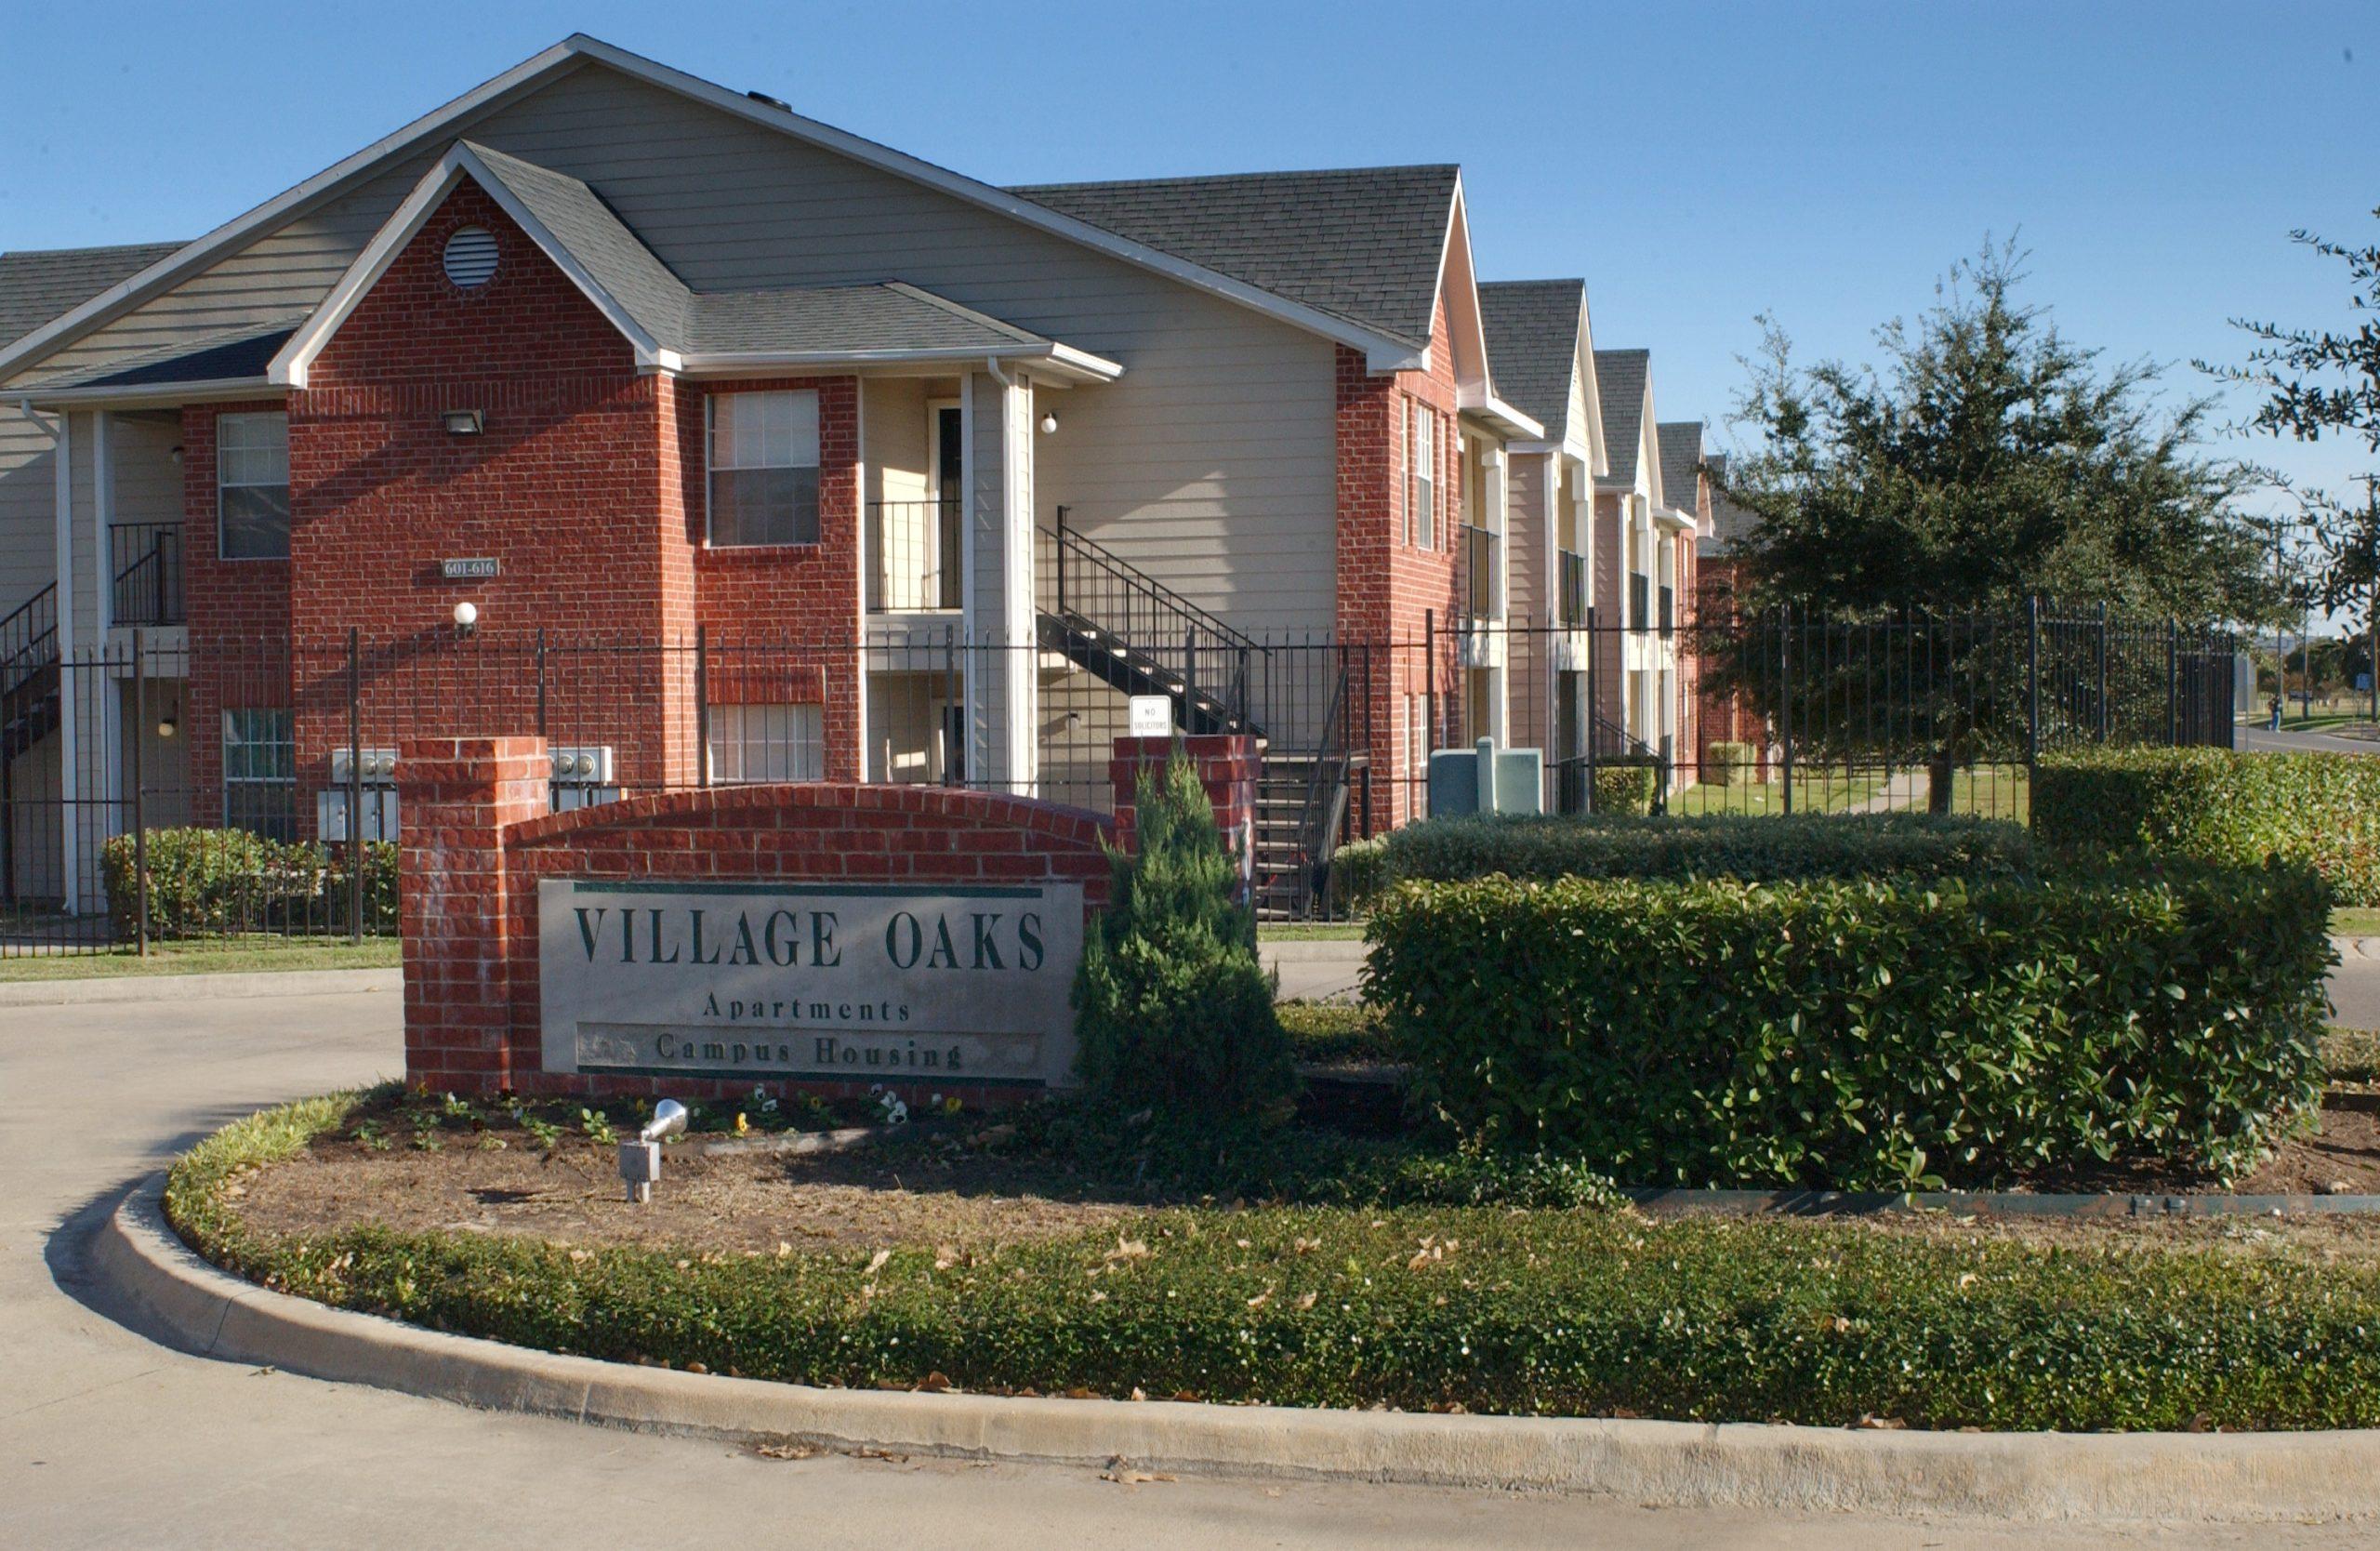 village oaks scaled - Campus Housing